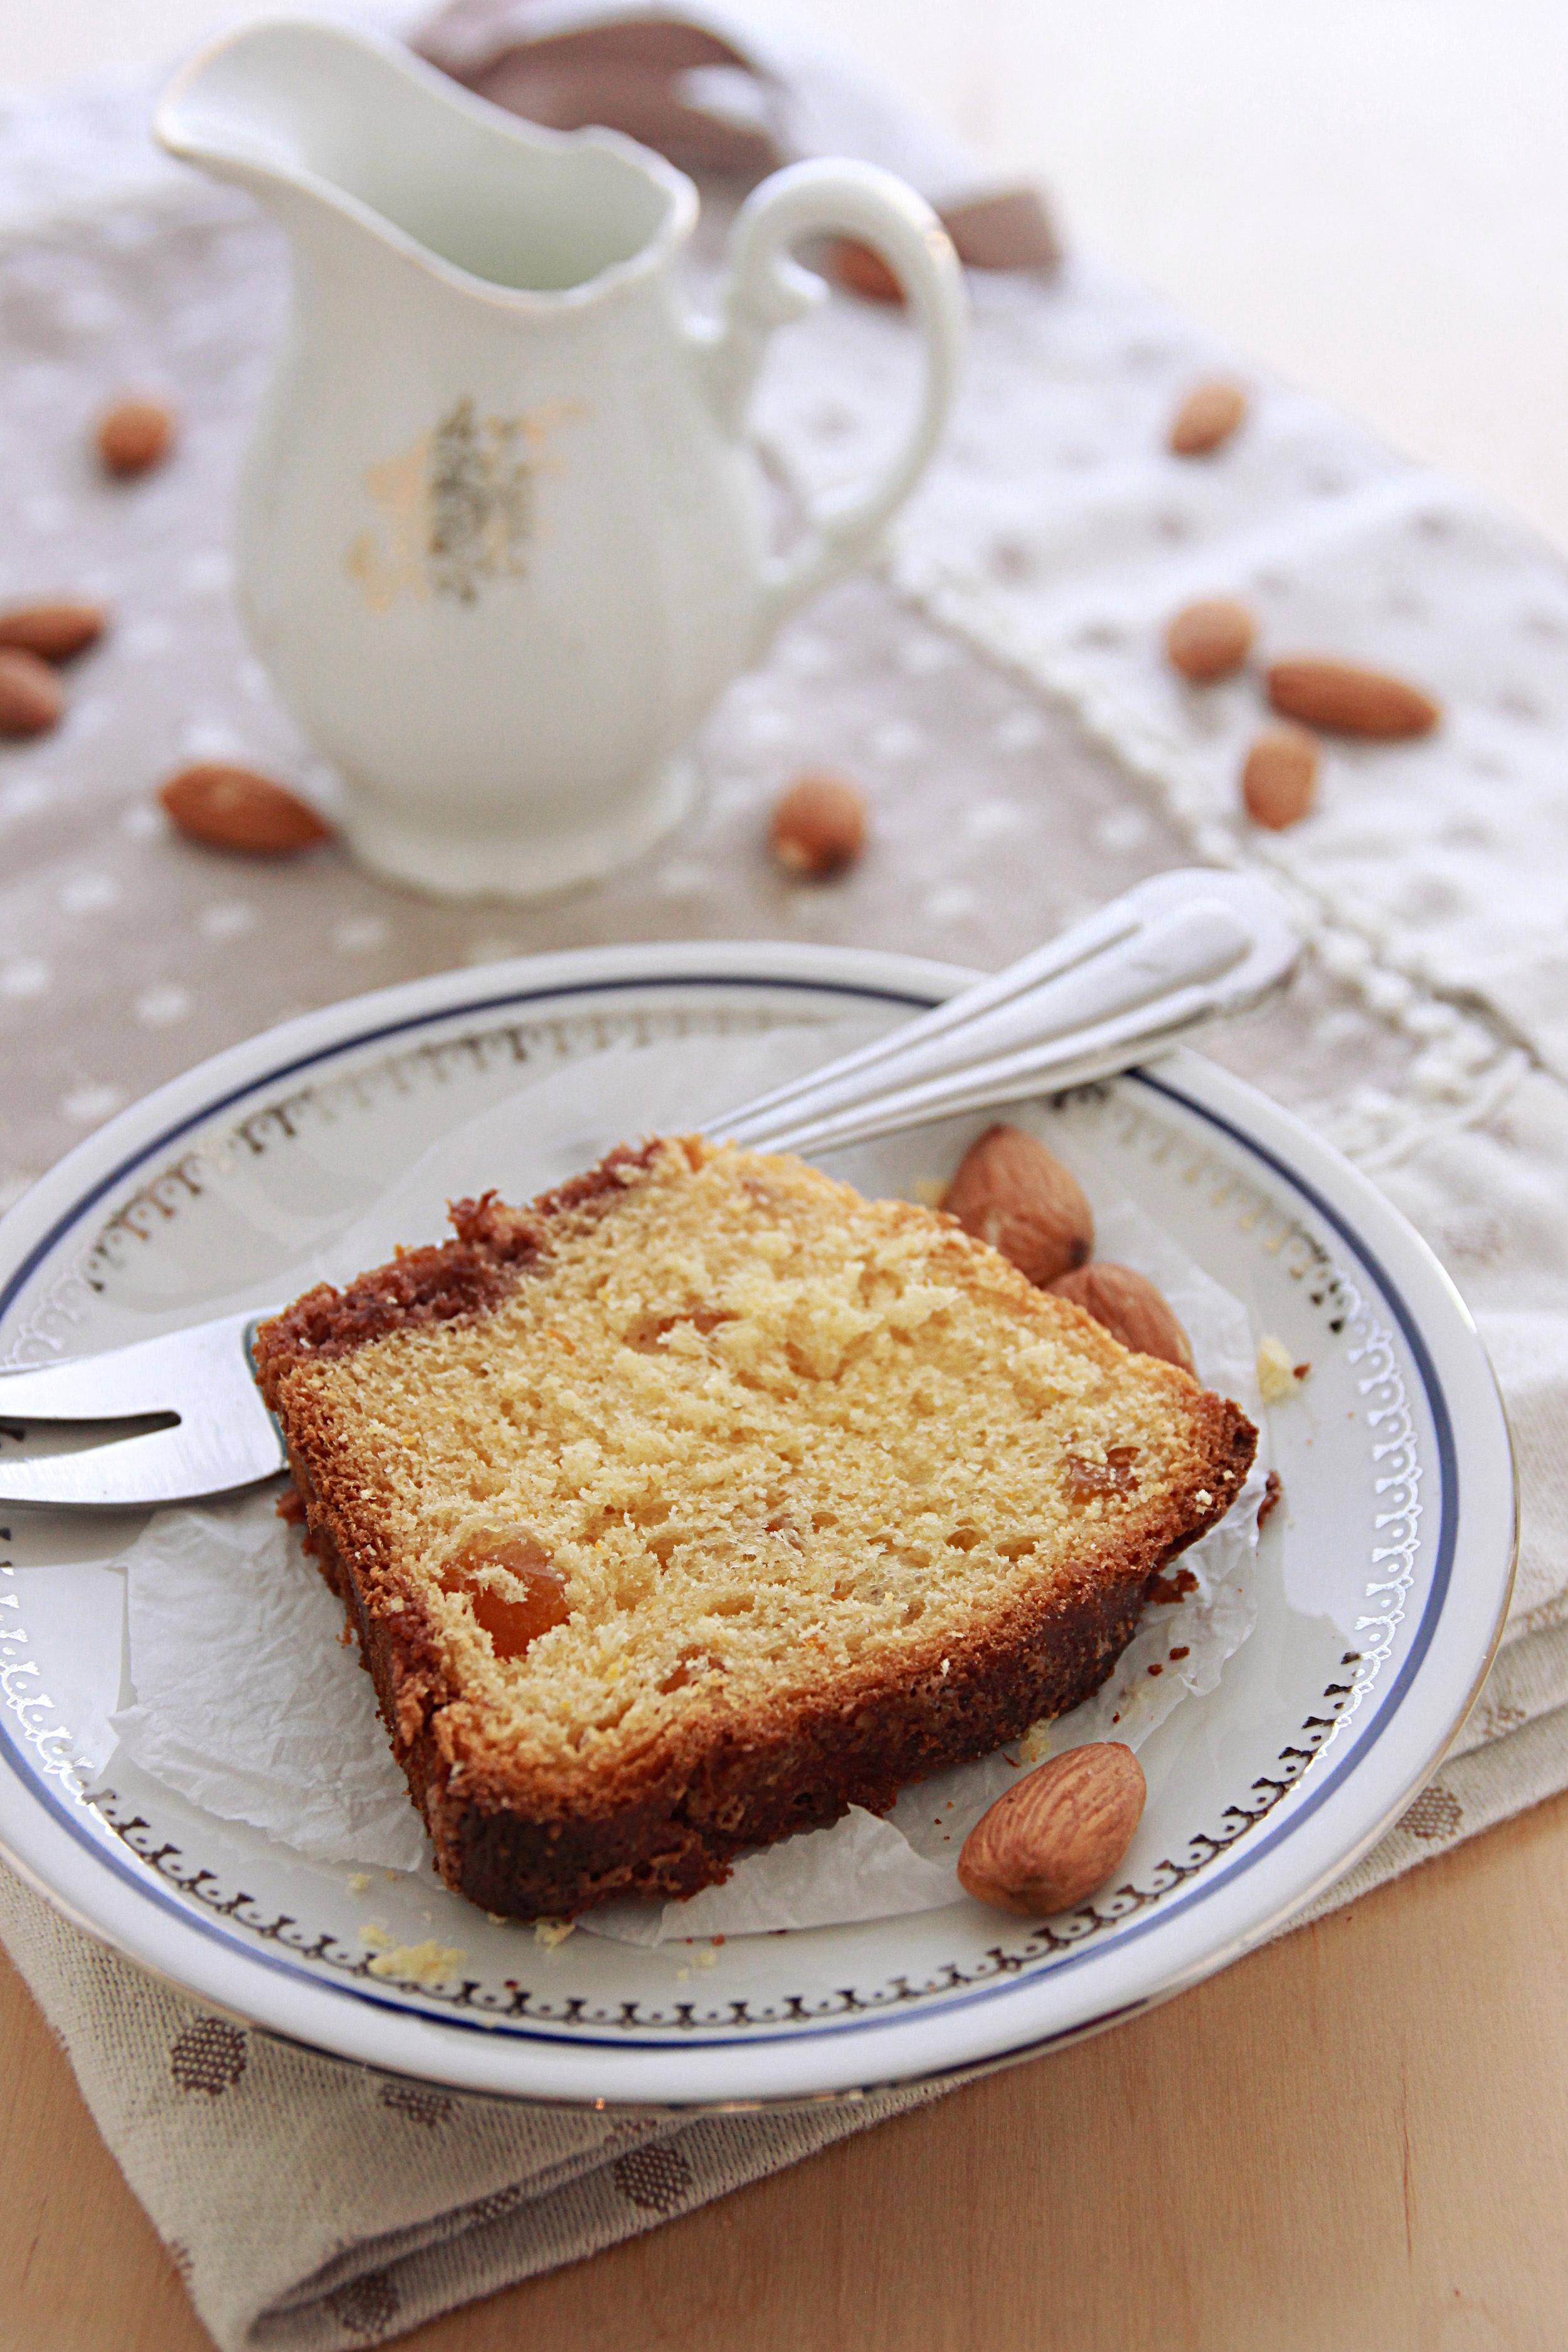 colomba Easter Italian cake